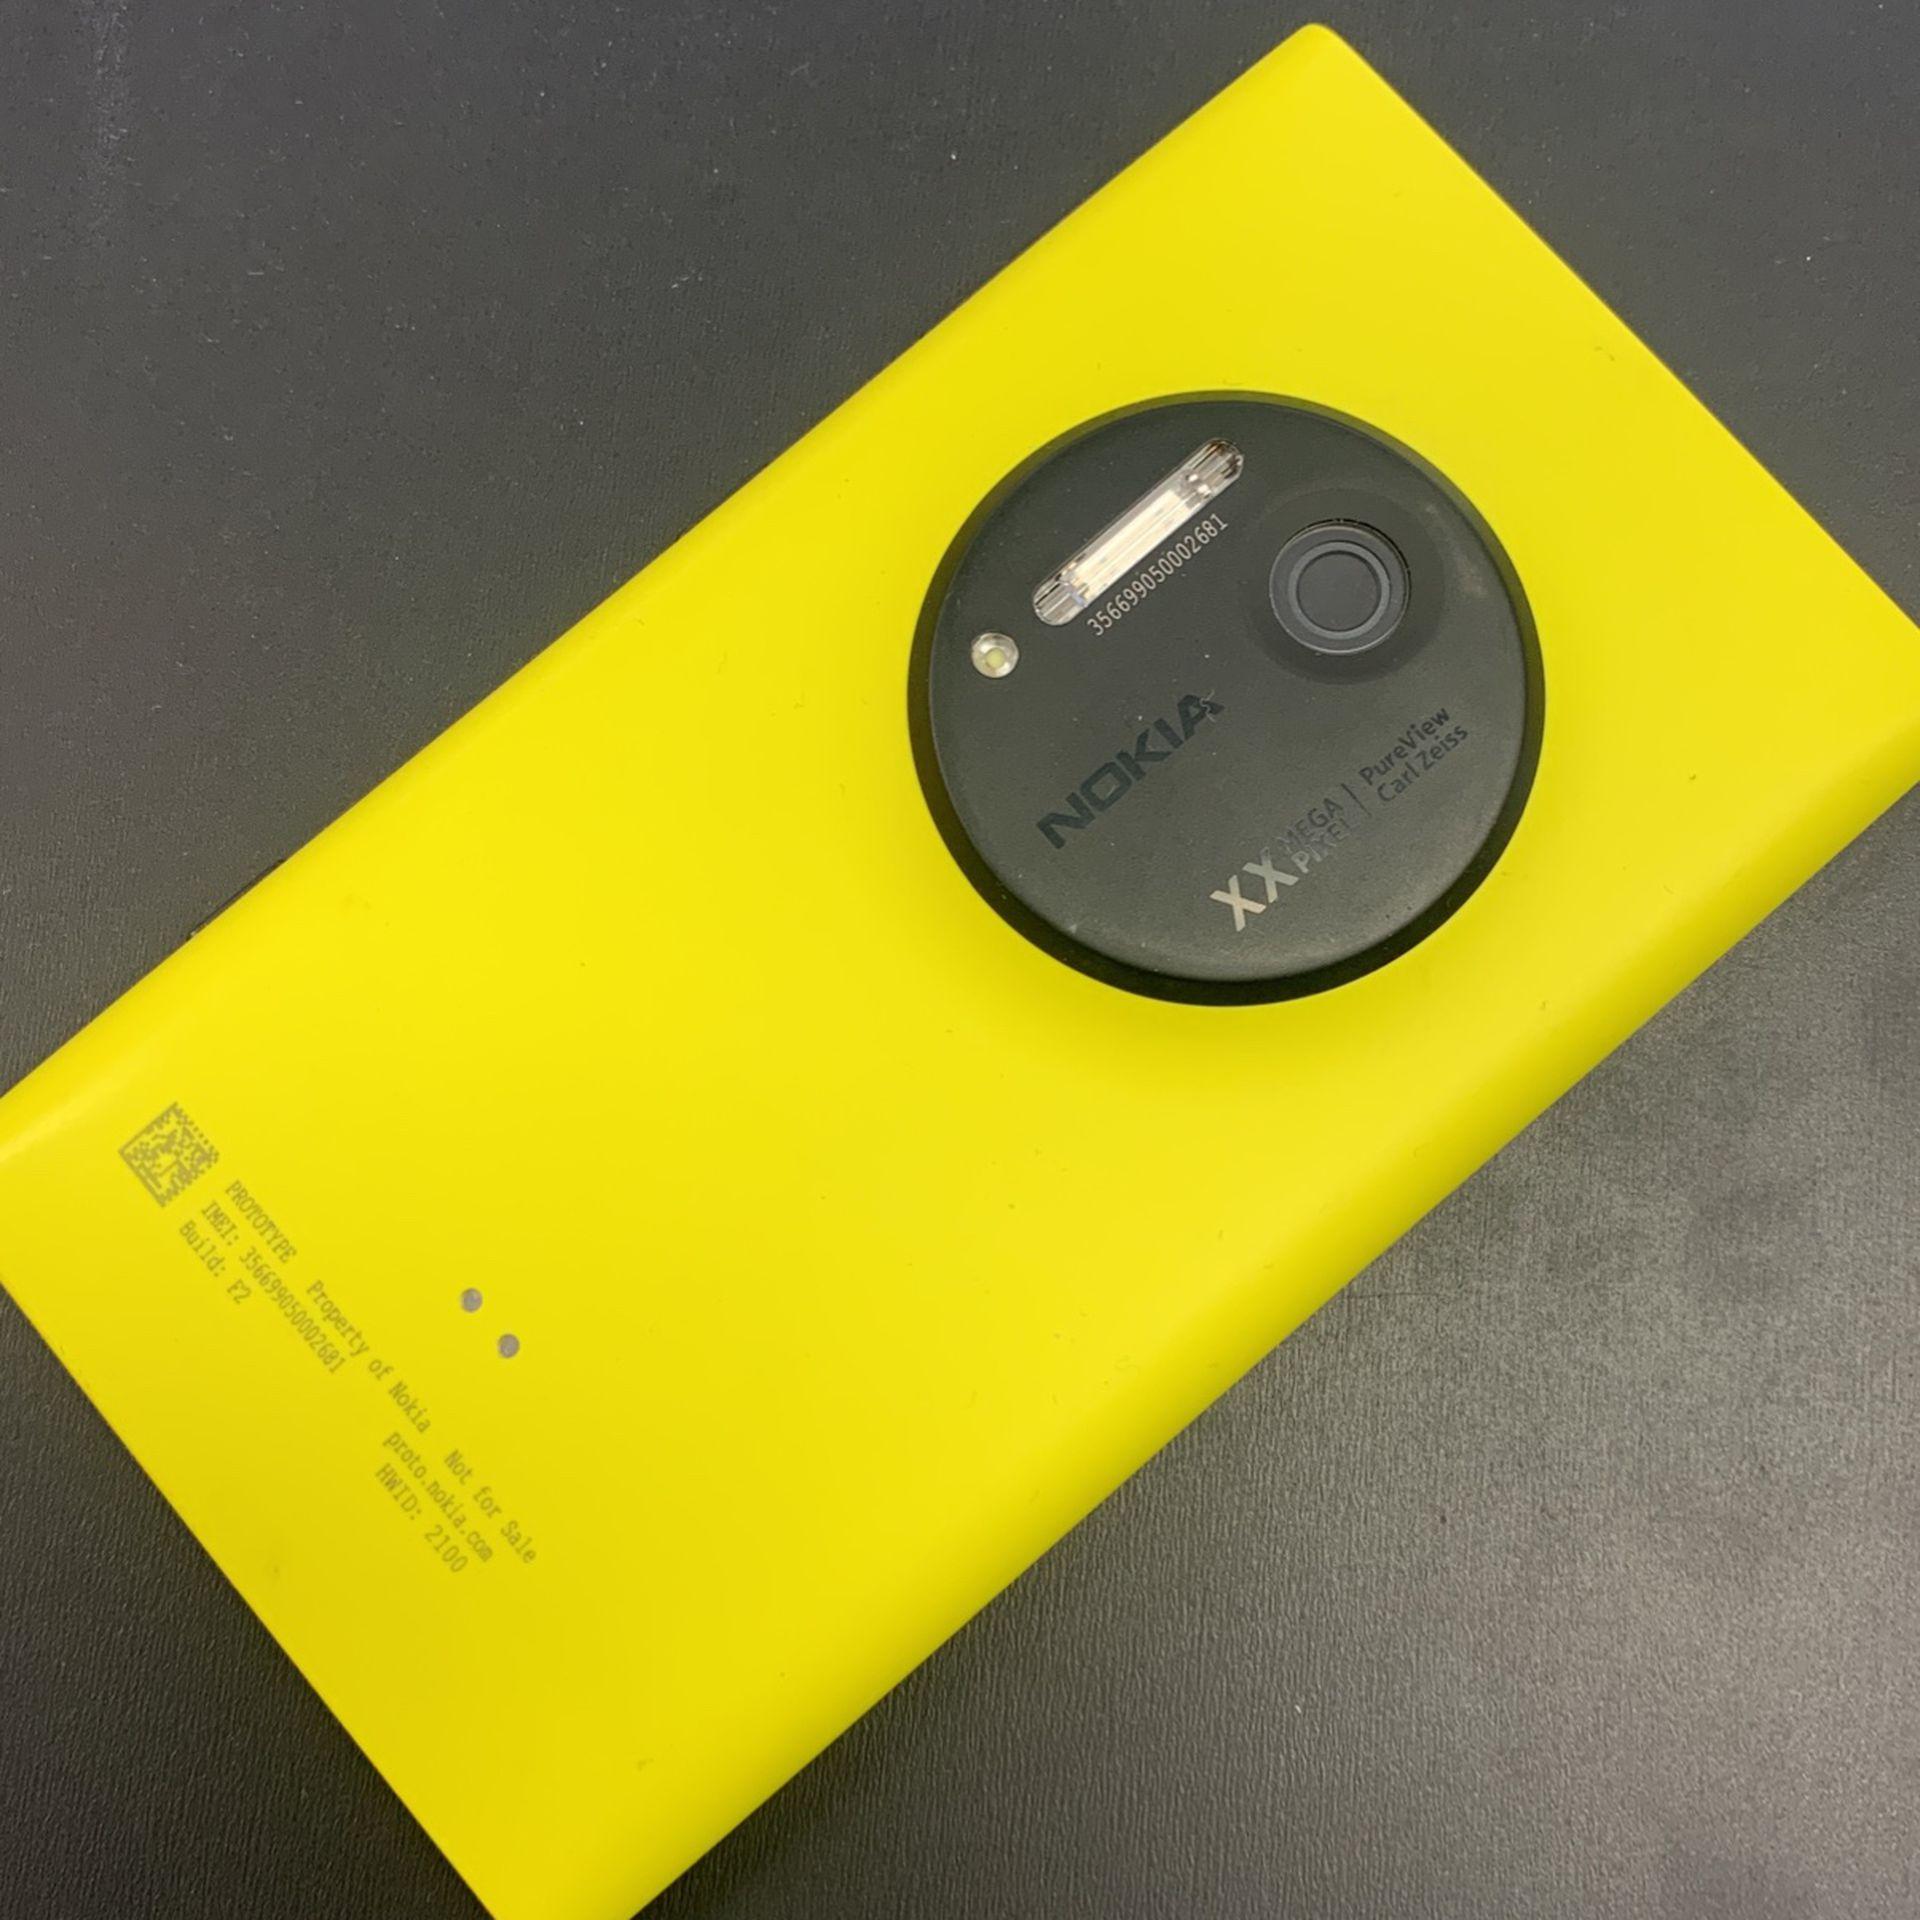 Nokia Prototype Cell Phone